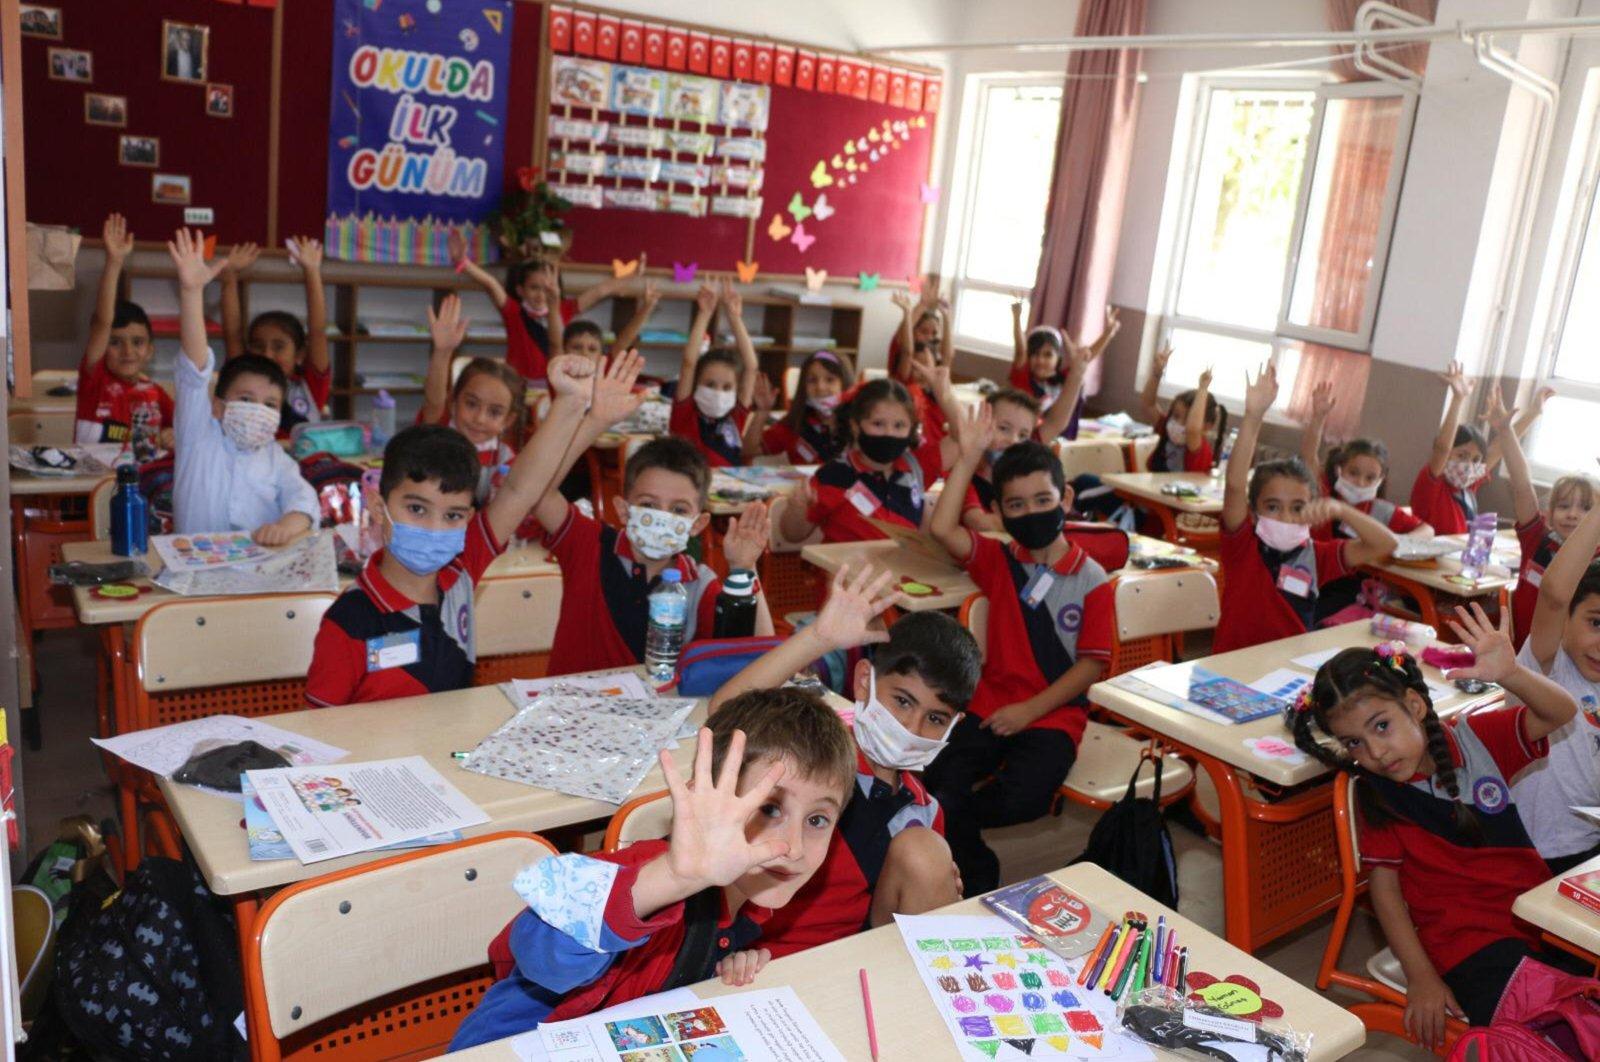 Students at a classroom of a primary school, in Muğla, southwestern Turkey, Sept. 7, 2021. (İHA PHOTO)